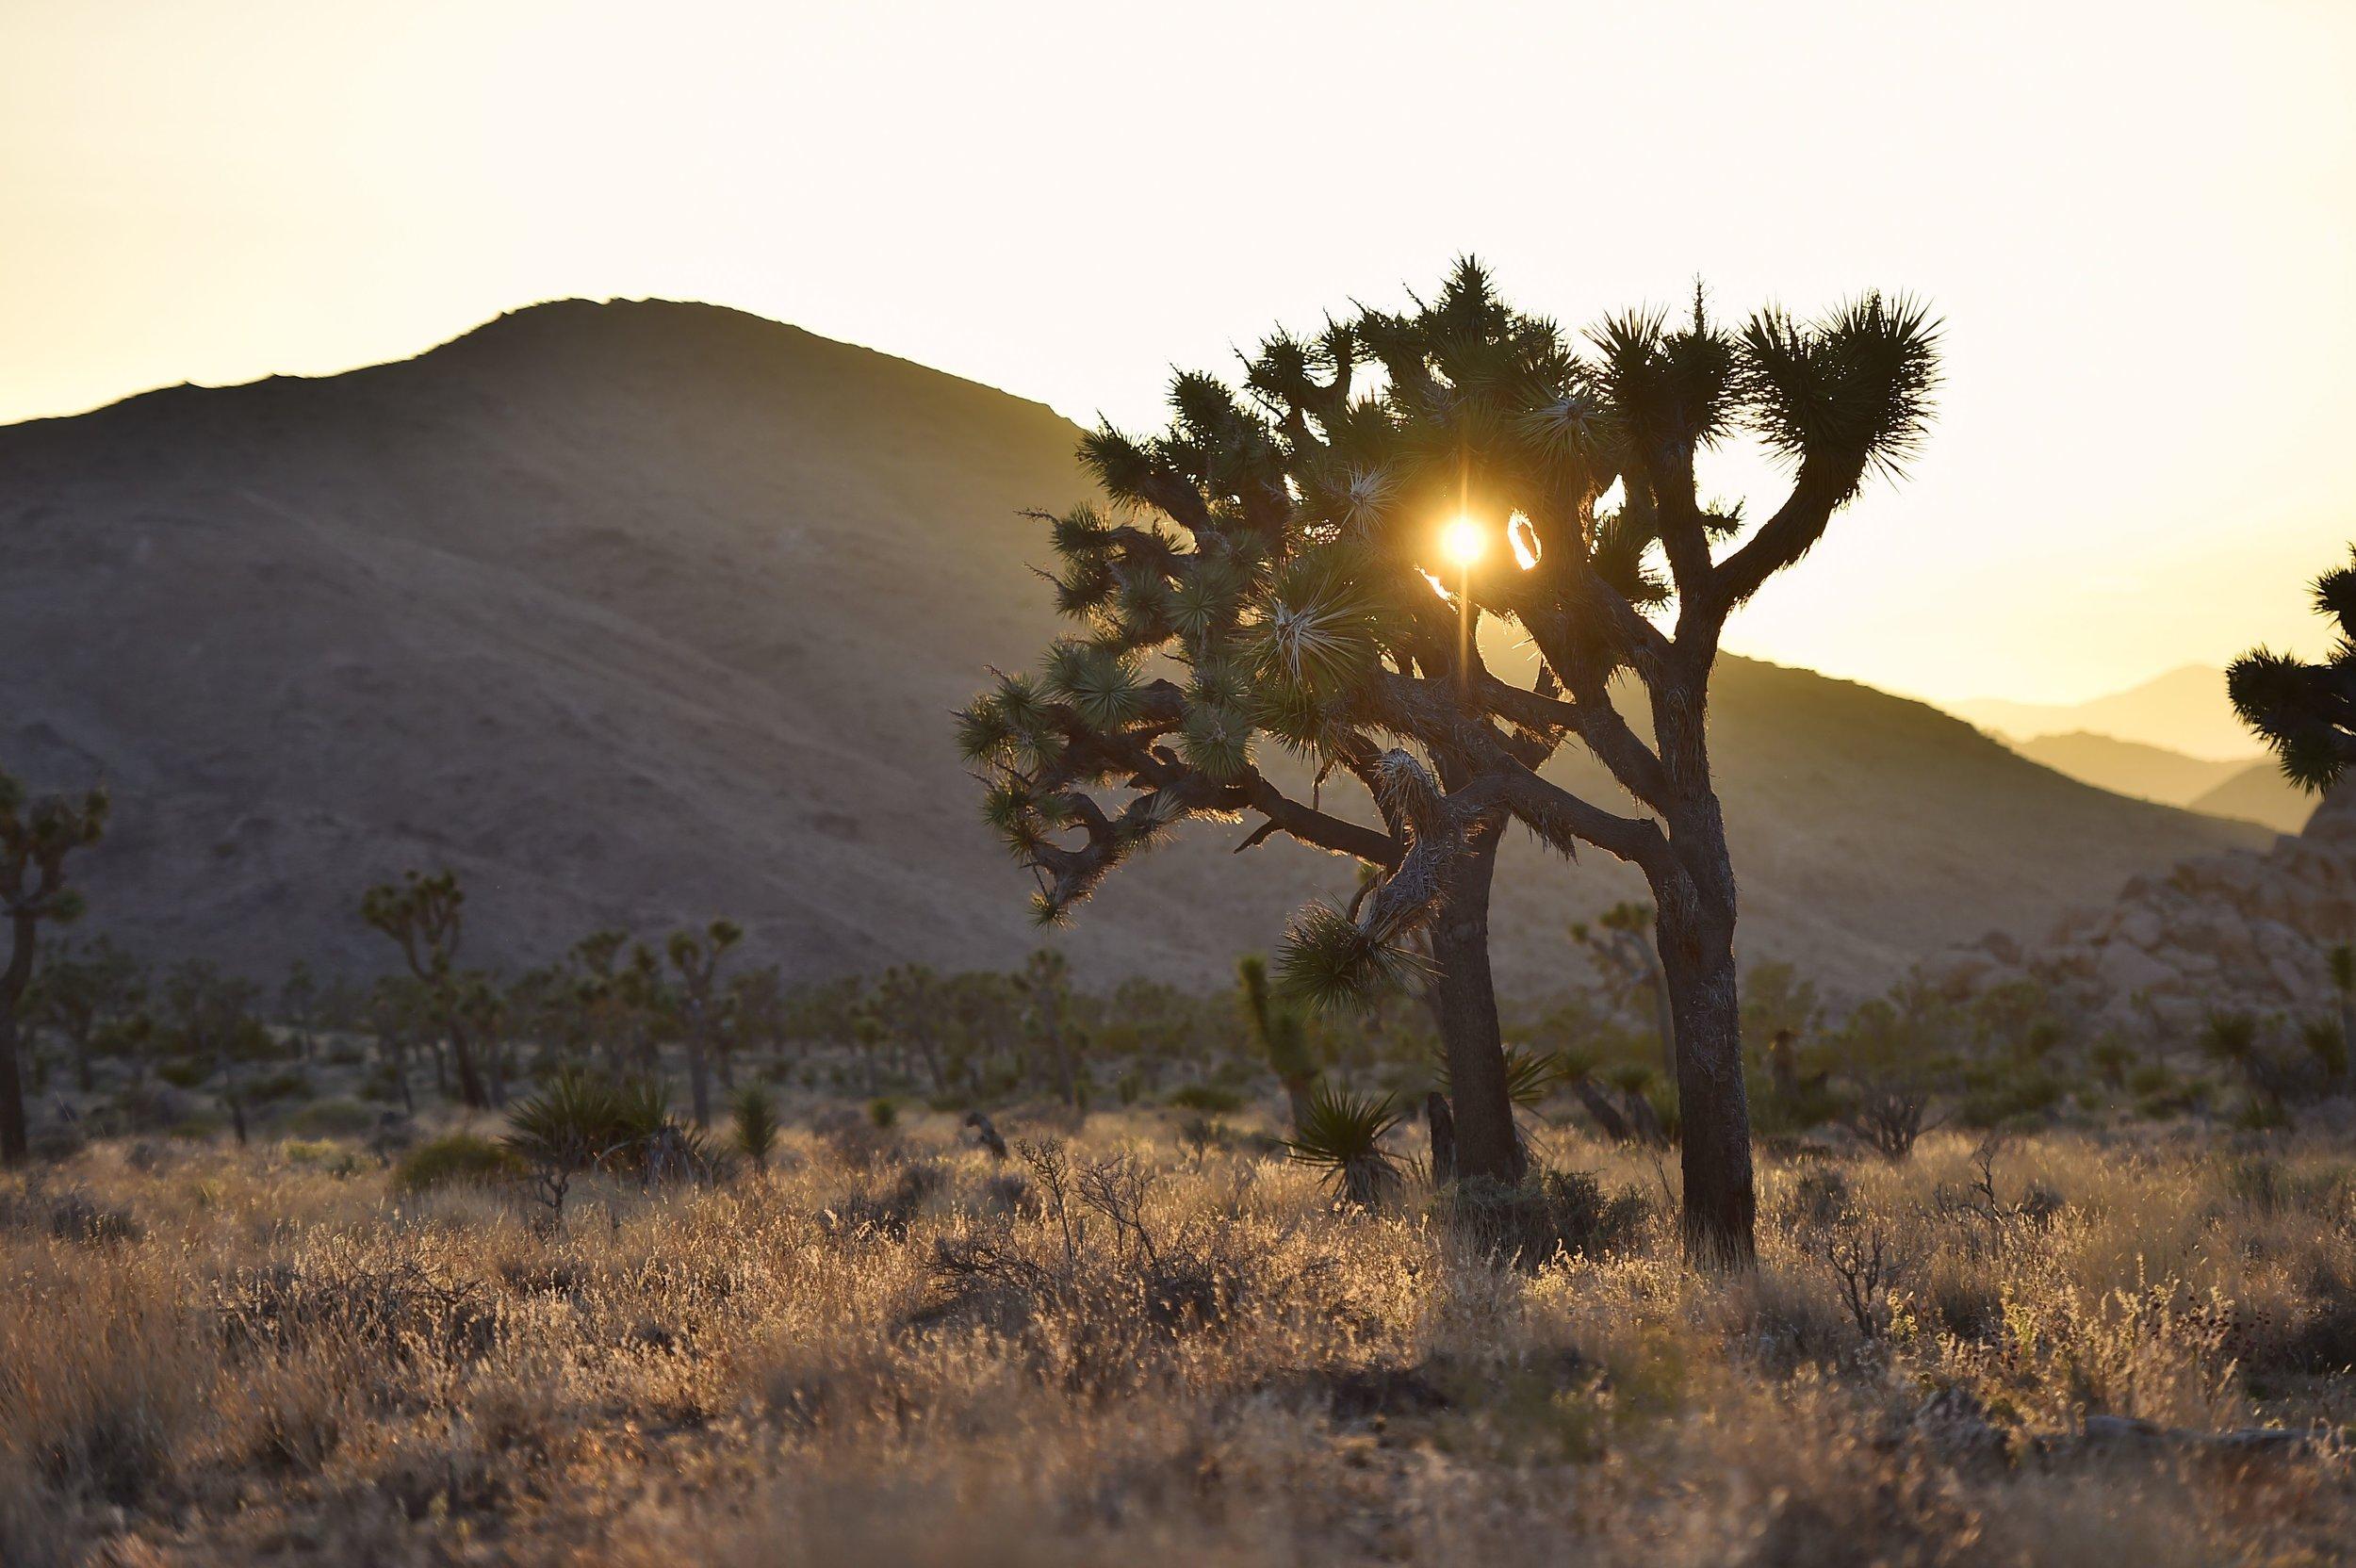 Warmth - Joshua Tree, CA